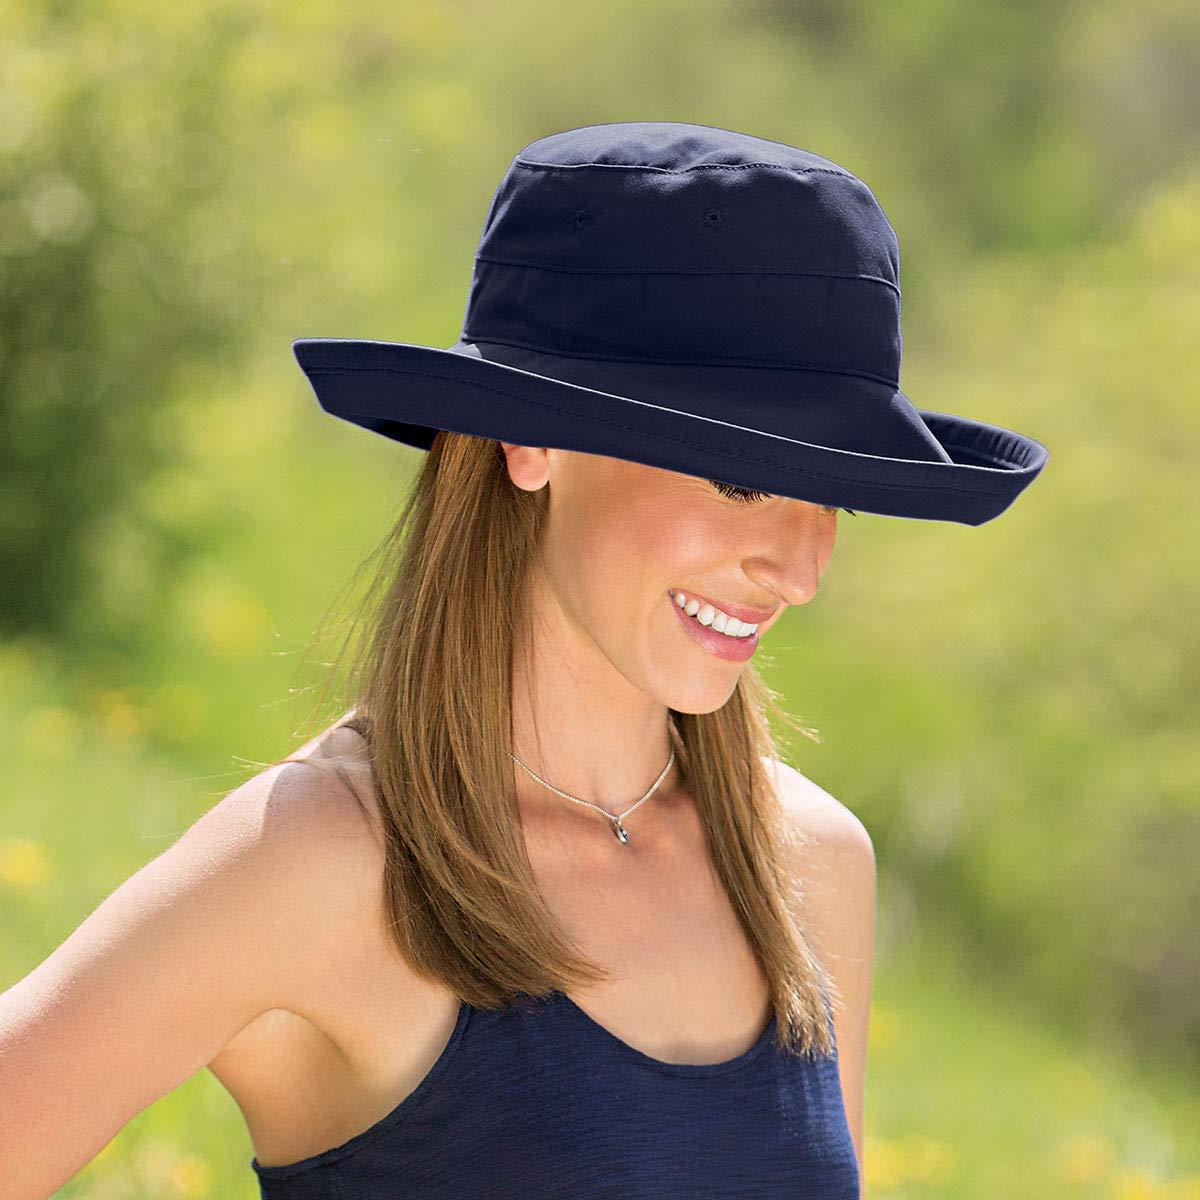 Wallaroo Hat Company Women's Casual Traveler Sun Hat - UPF 50+, Adjustable, Ready for Adventure, Designed in Australia, White